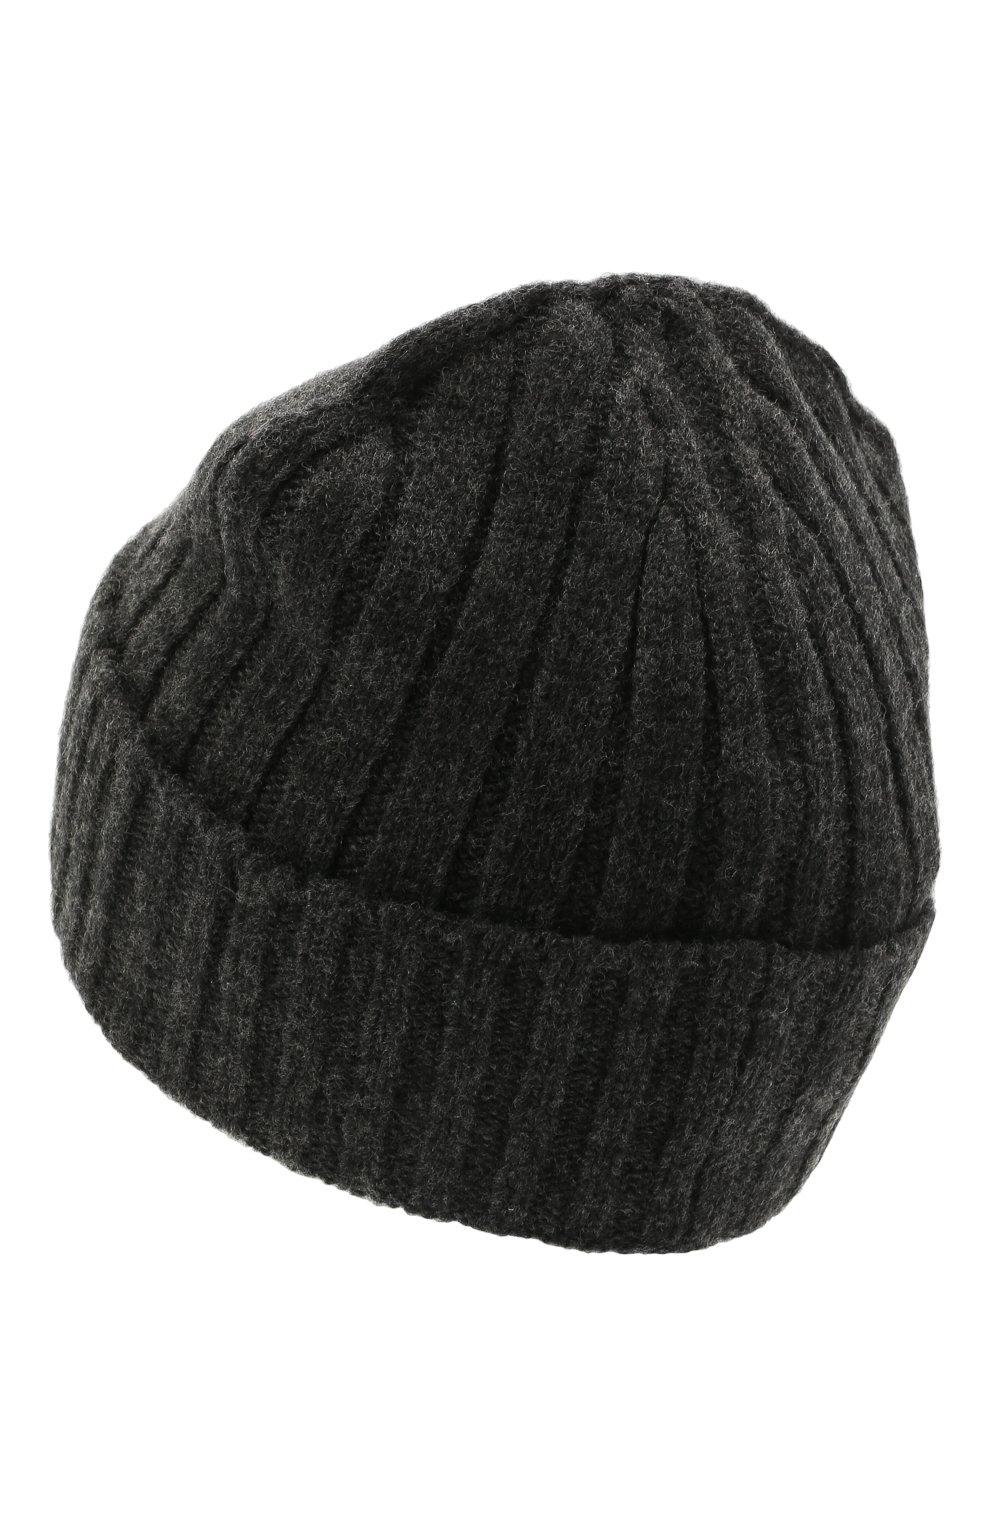 Мужская шерстяная шапка STONE ISLAND темно-серого цвета, арт. 7515N24B5 | Фото 2 (Материал: Шерсть; Кросс-КТ: Трикотаж)